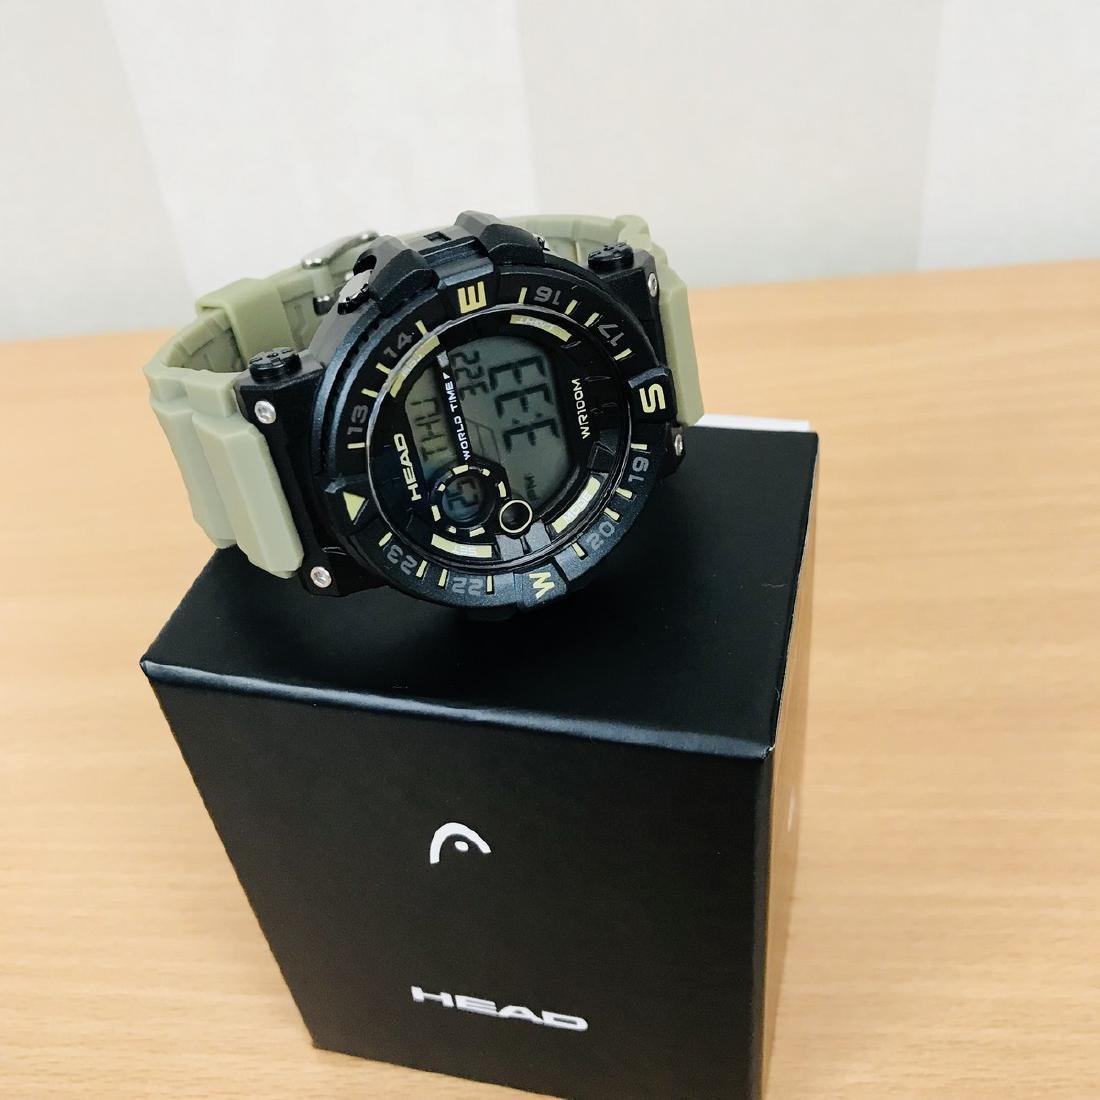 HEAD – World Timer Multifunction Watch - 8